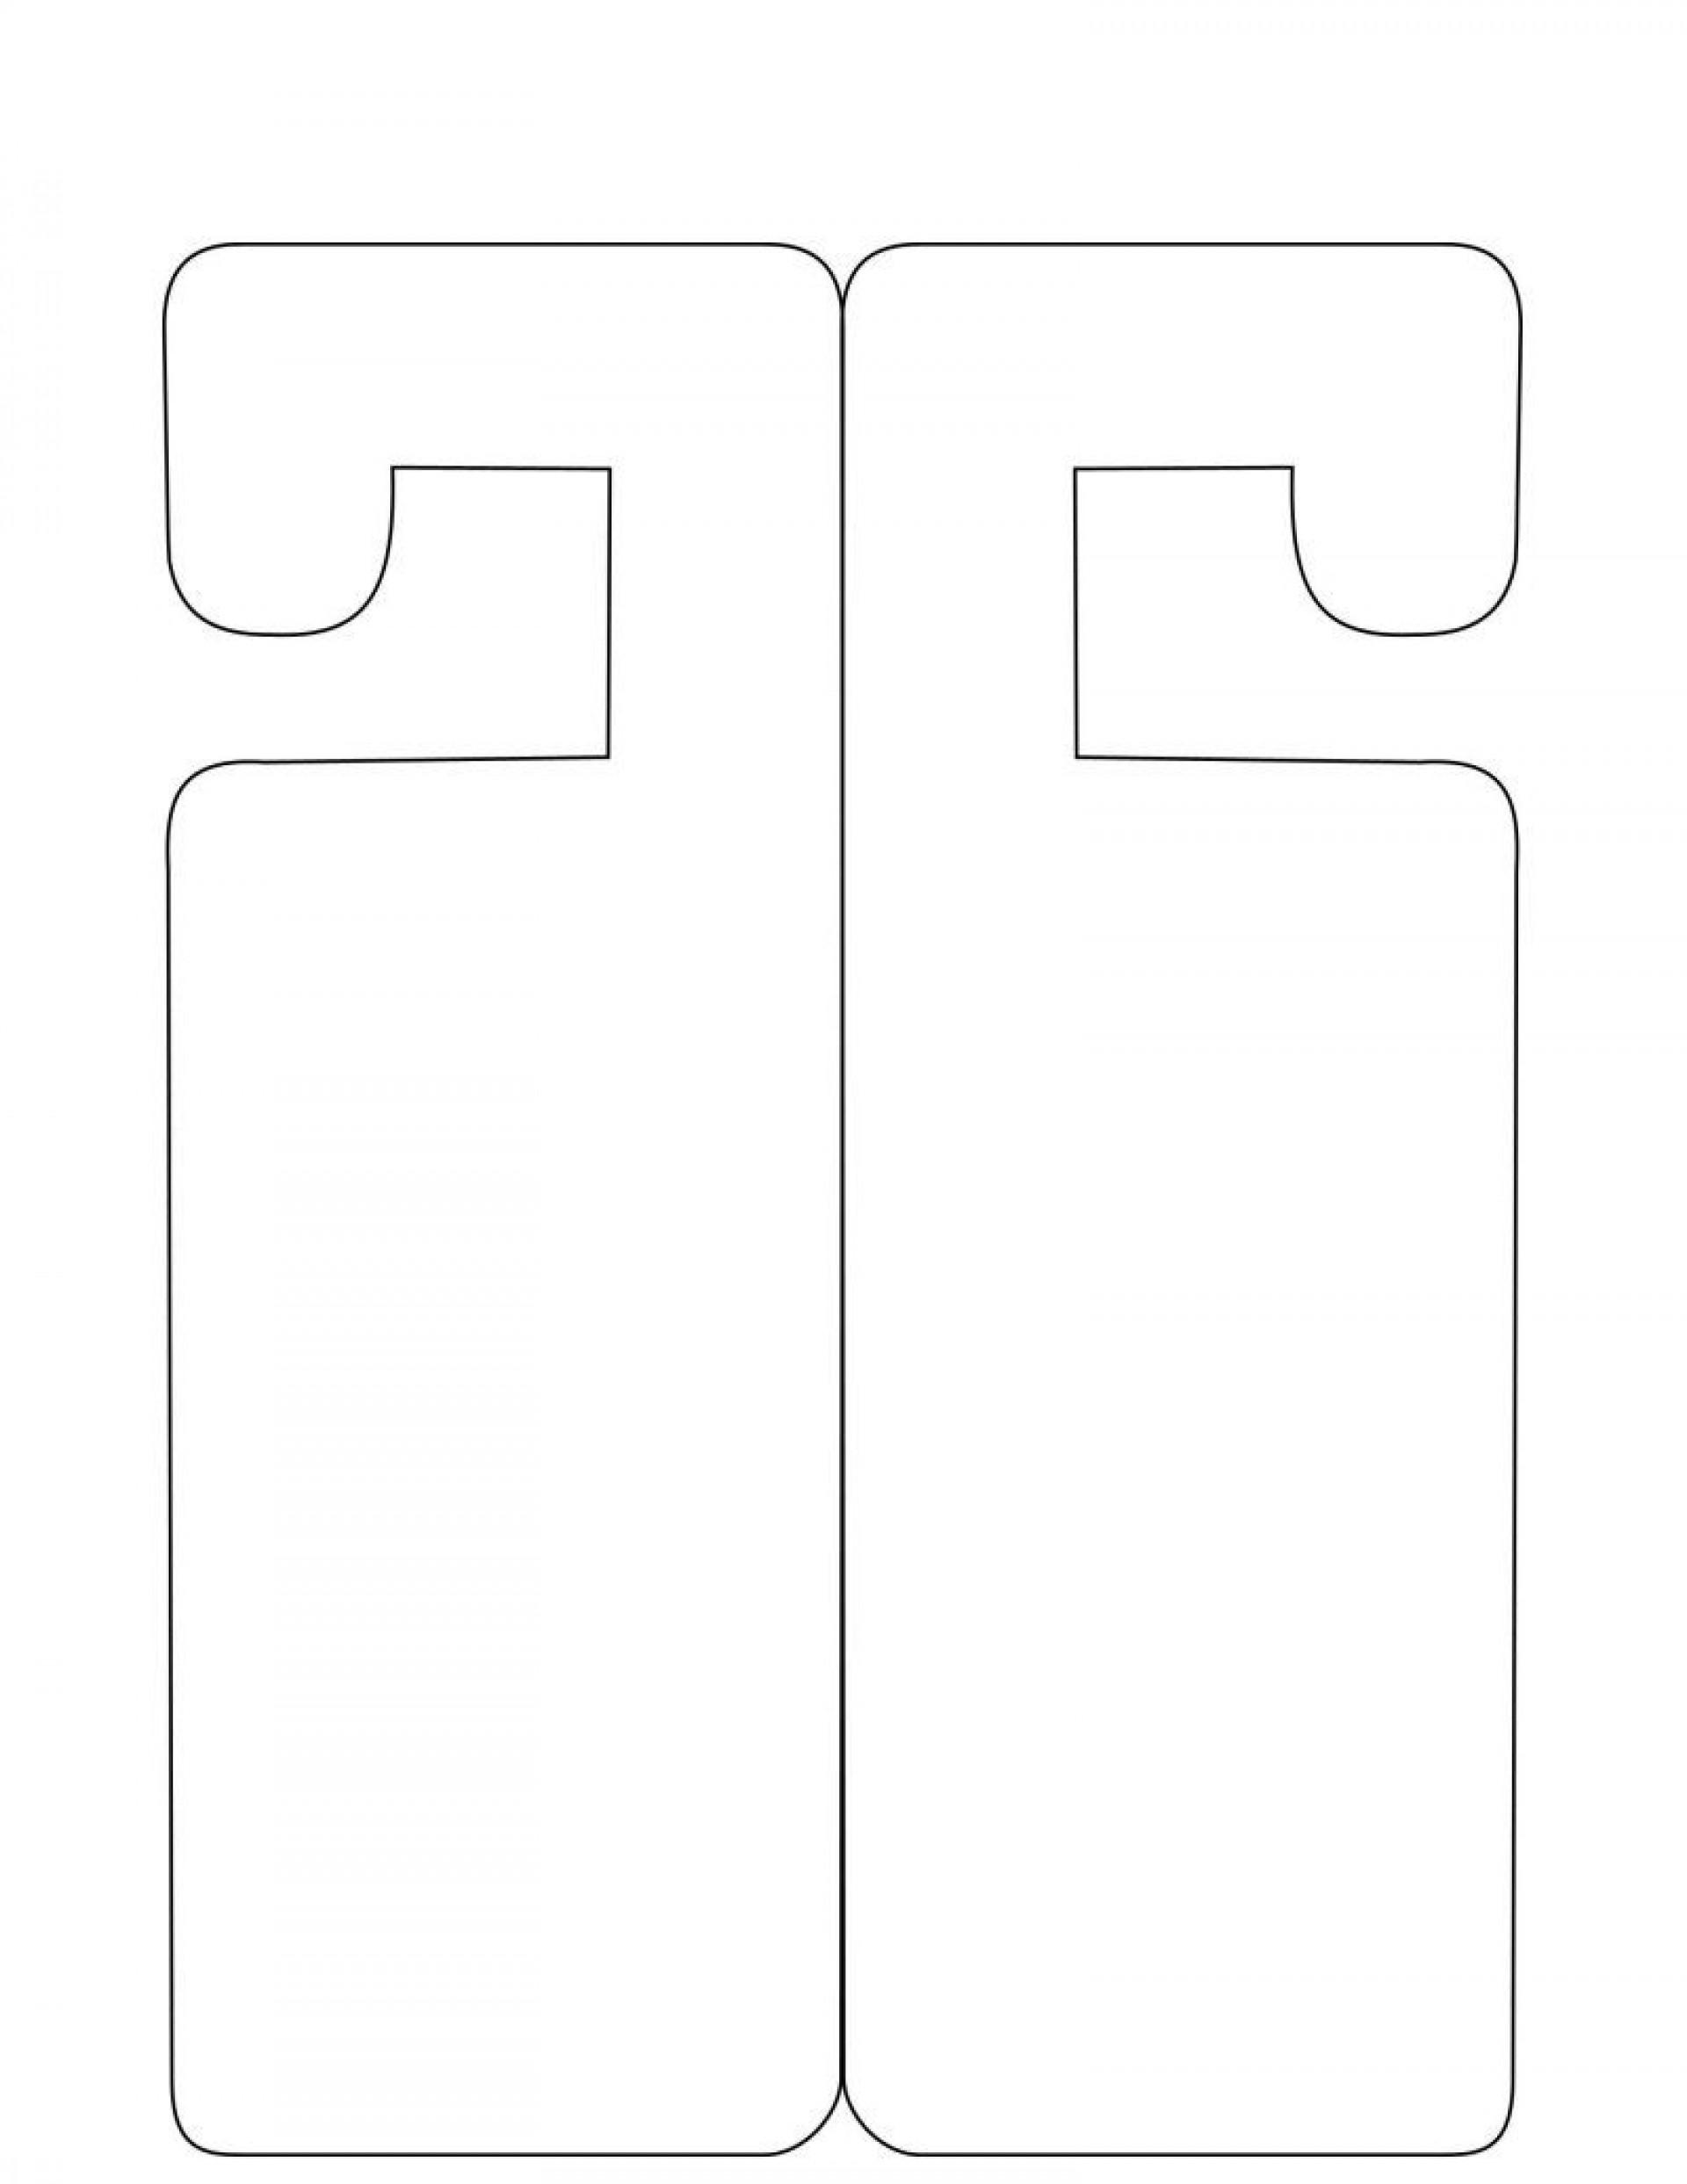 007 Singular Free Printable Door Hanger Template High Def  Templates Wedding Editable1920